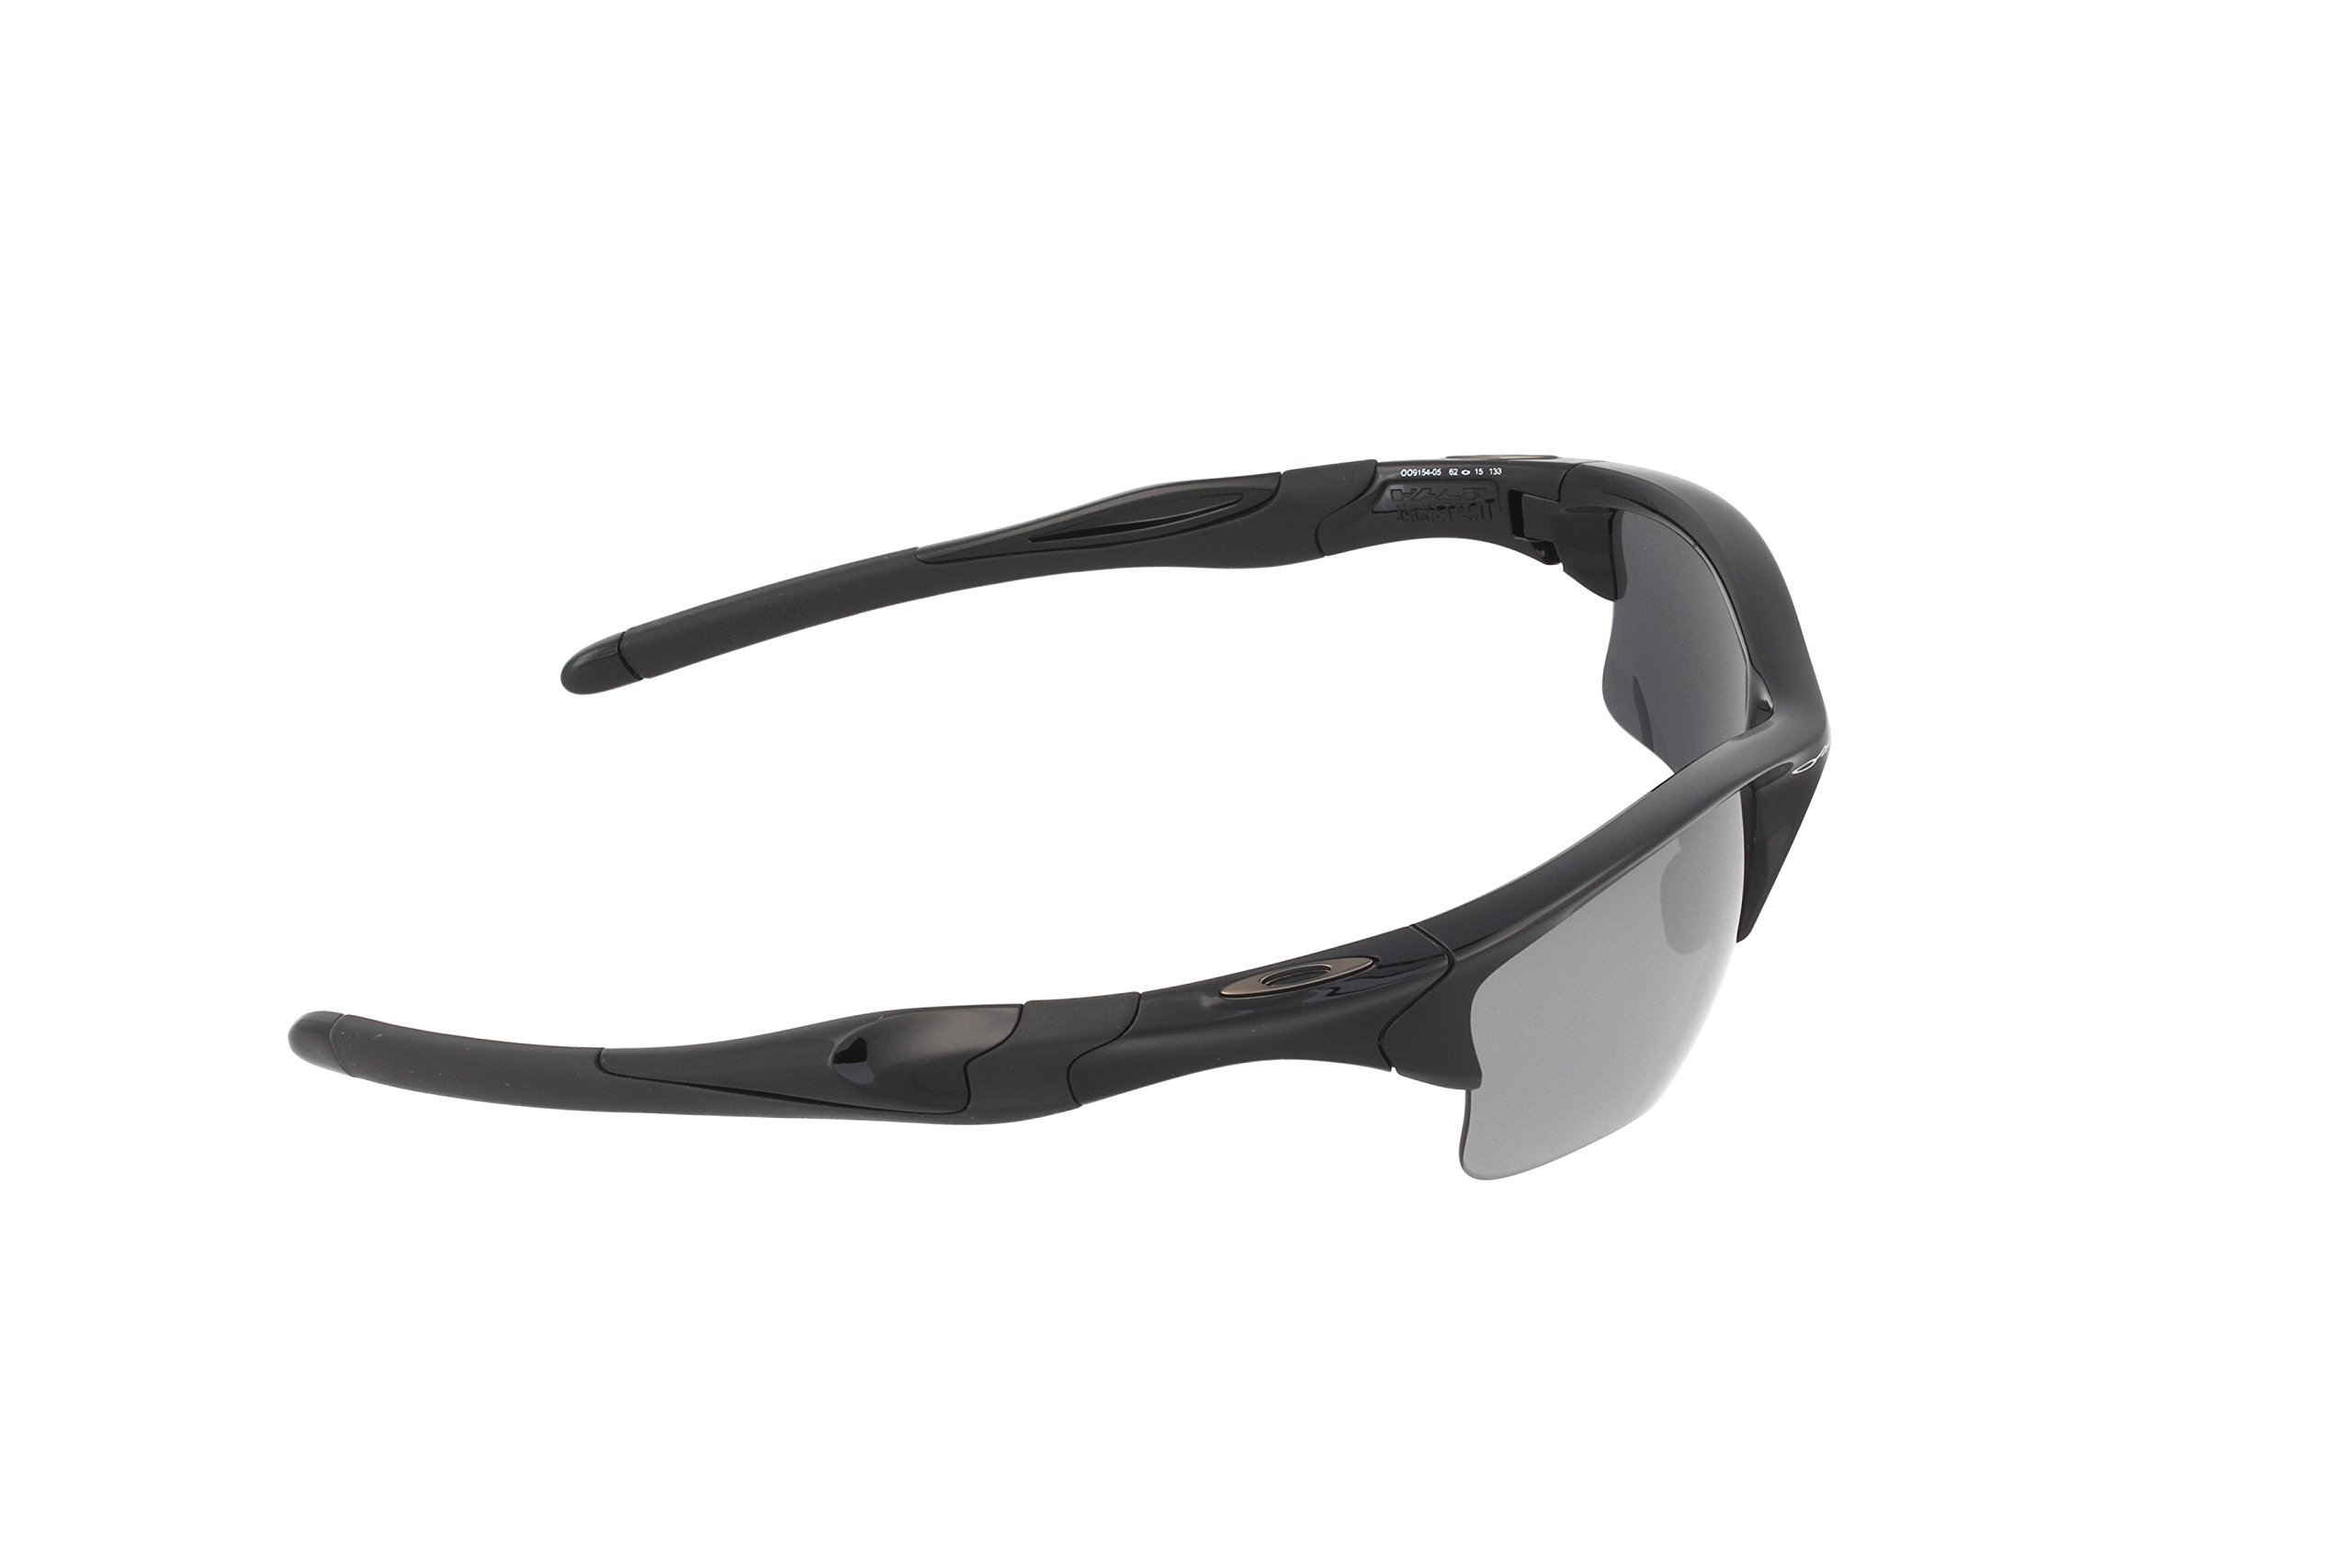 Oakley Mens Half Jacket 2.0 XL OO9154-05 Polarized Sunglasses 58mm, Polished Black Frame/Black Iridium Polarized Lens, 62 mm by Oakley (Image #3)